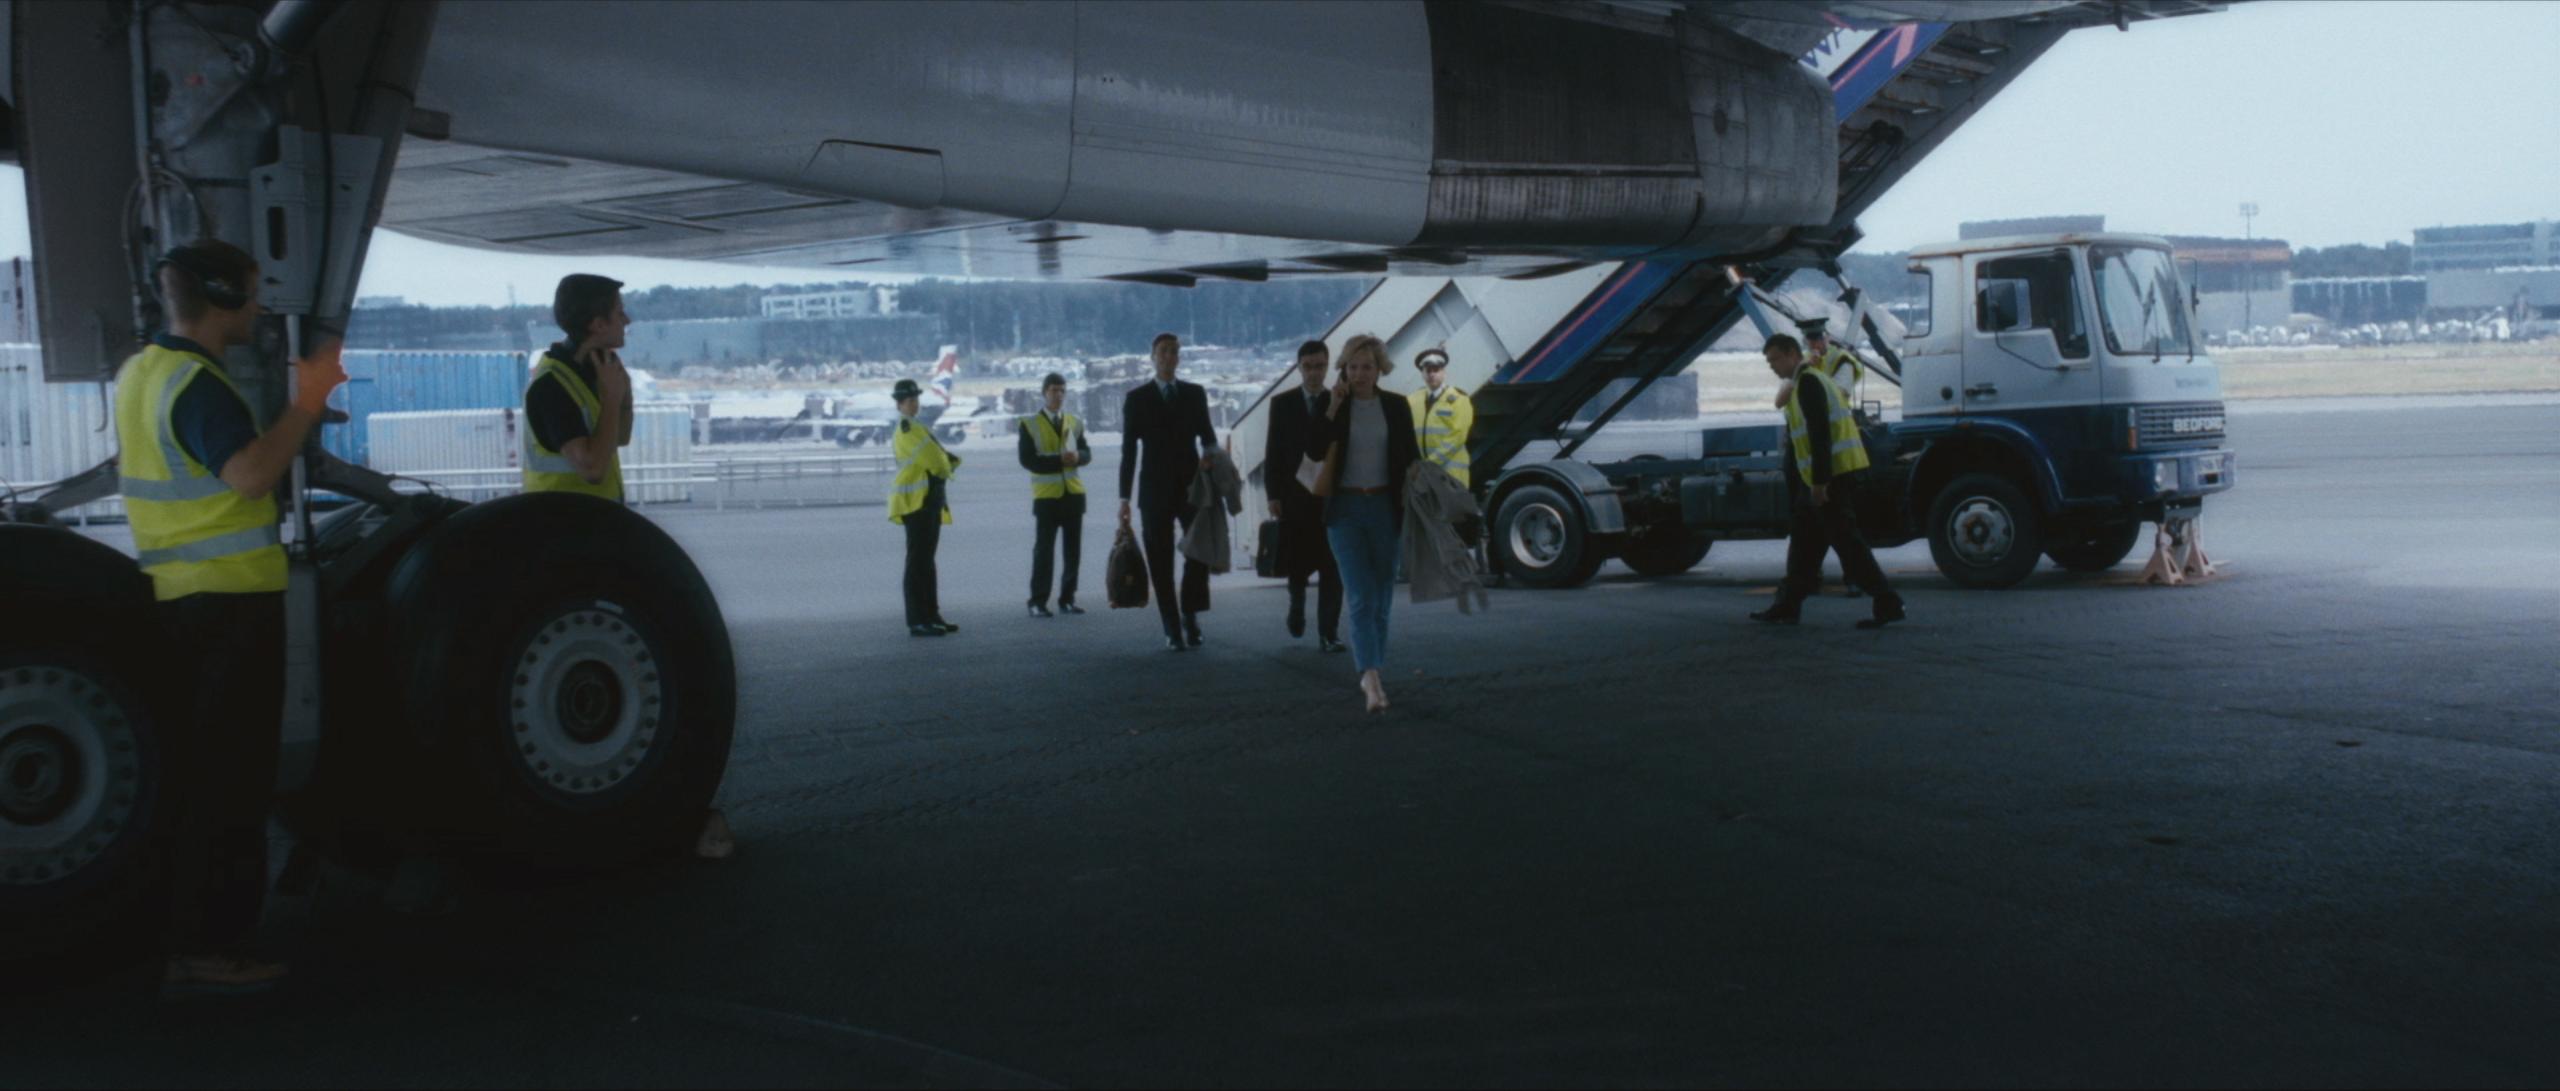 diana_airport2